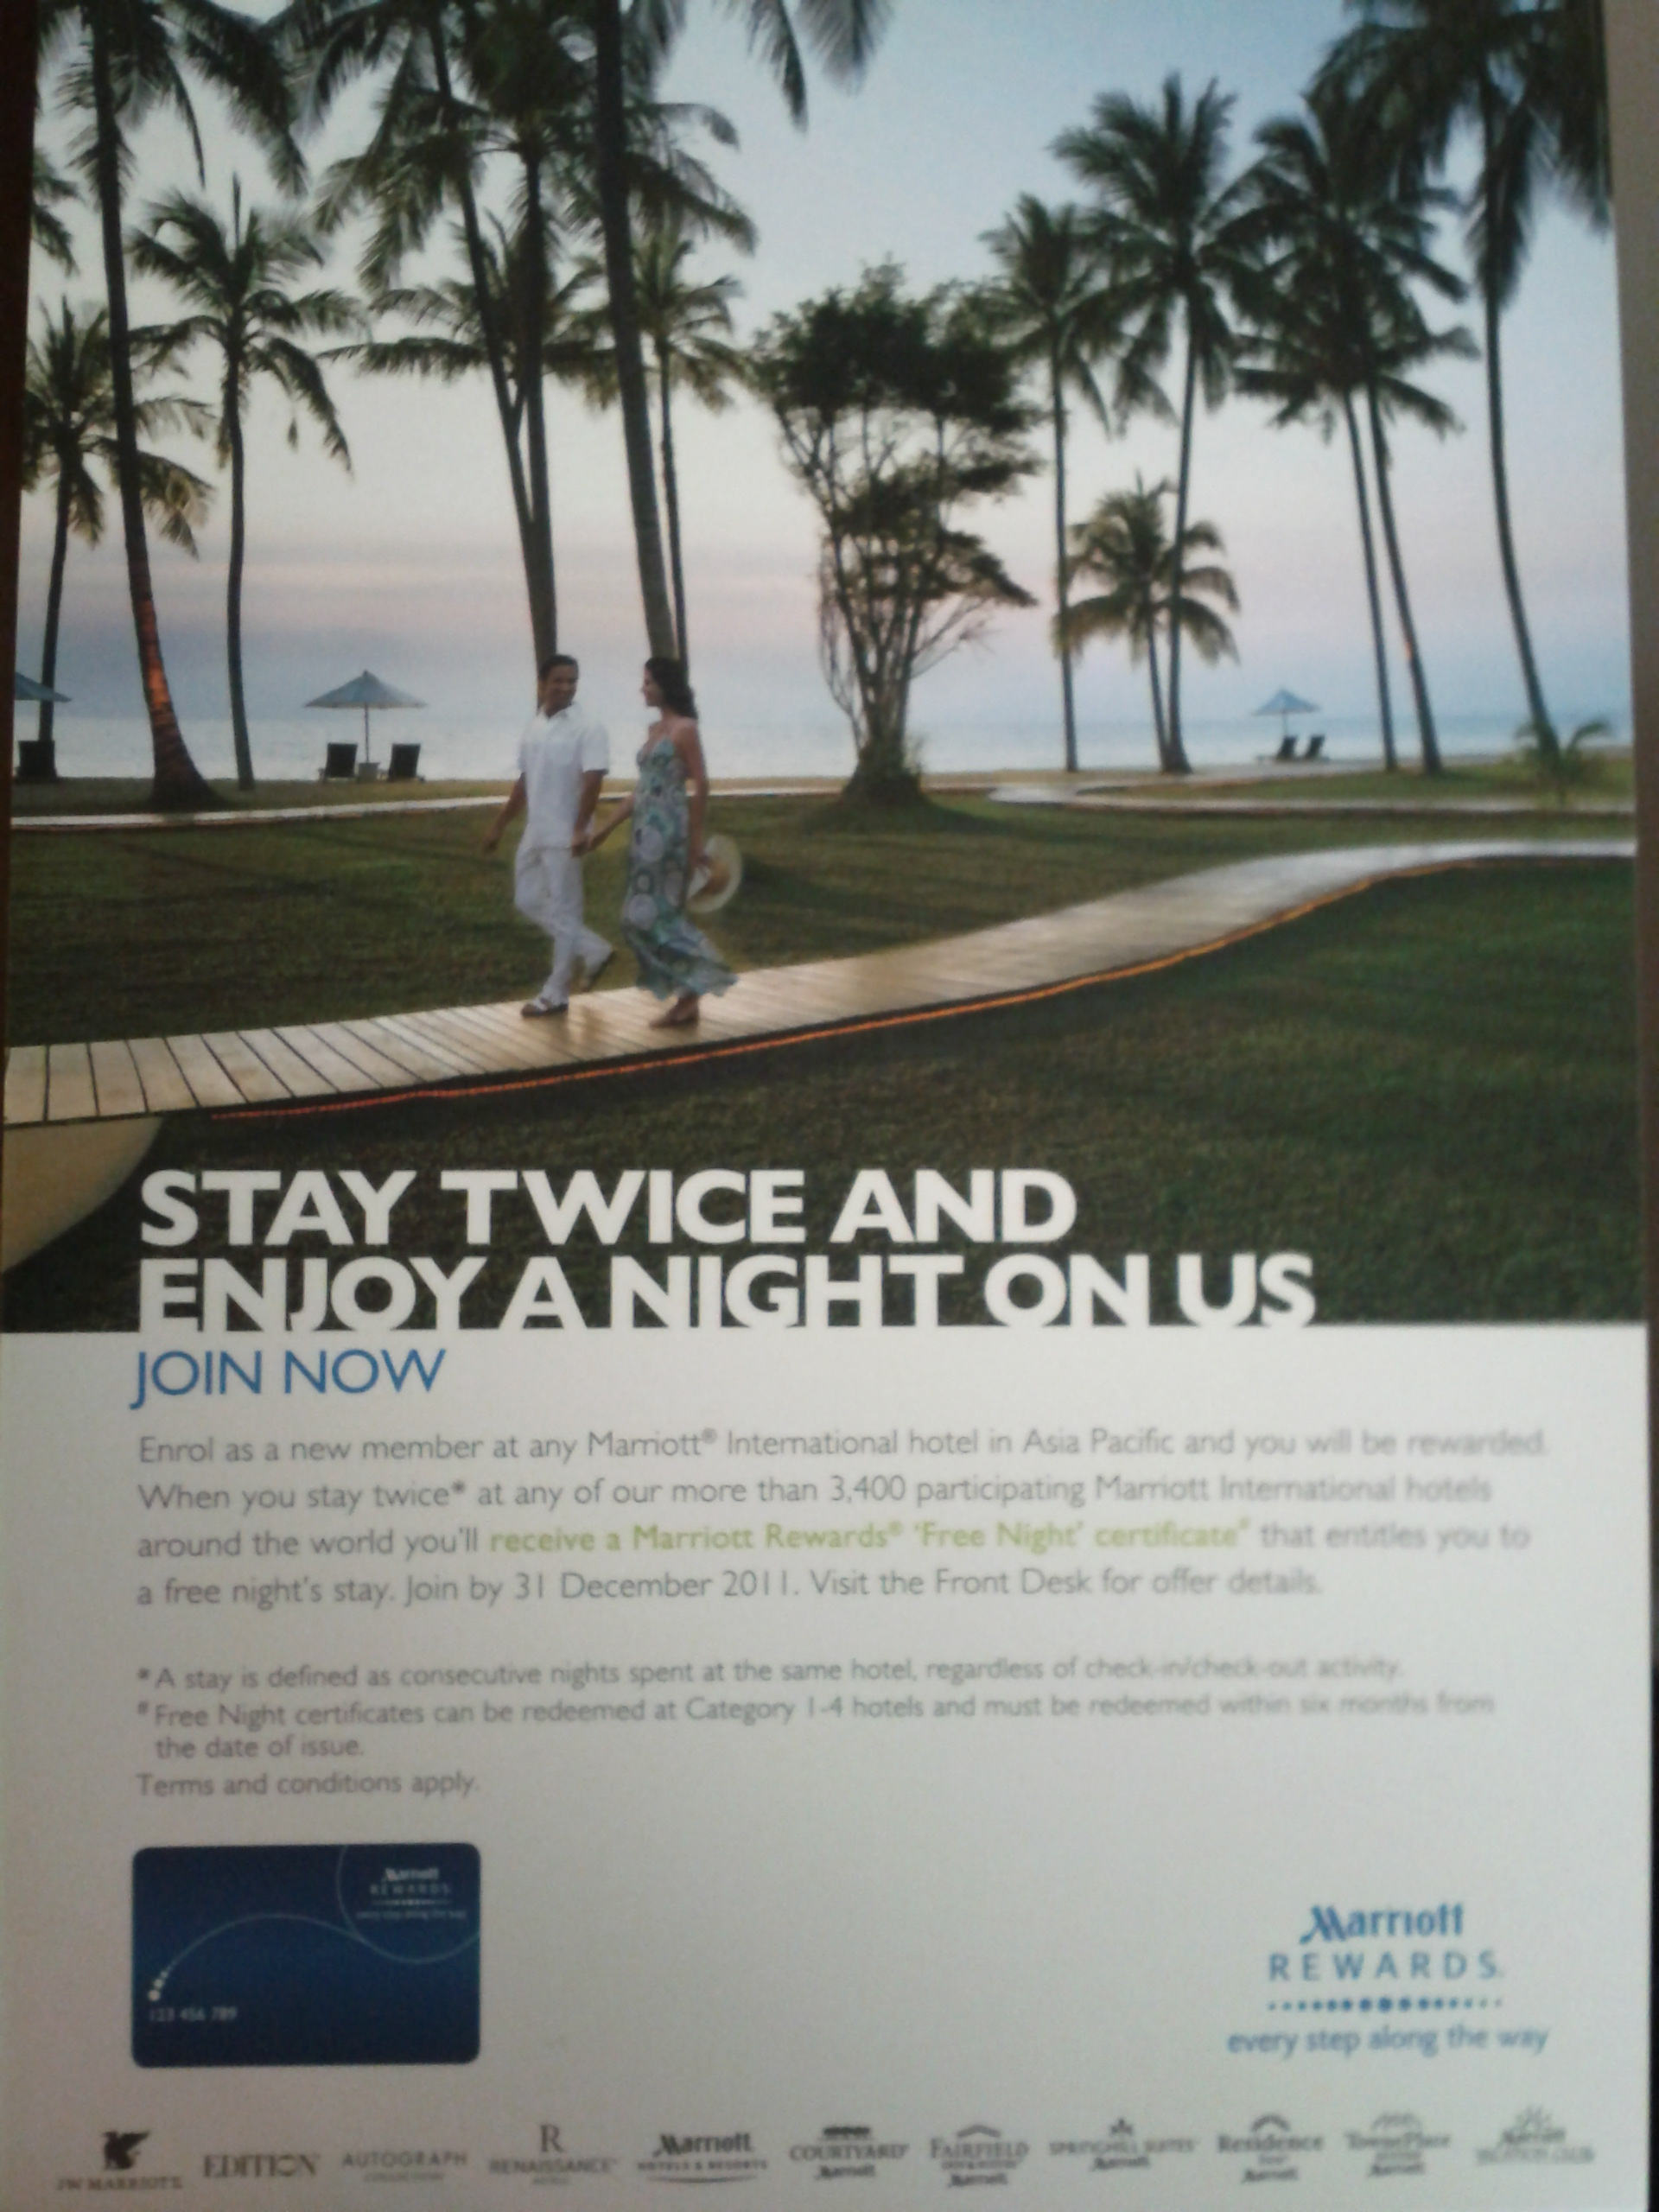 Marriott rewards sign up bonus free night certificate or instant marriott rewards sign up offer stay twice stay free 1betcityfo Choice Image